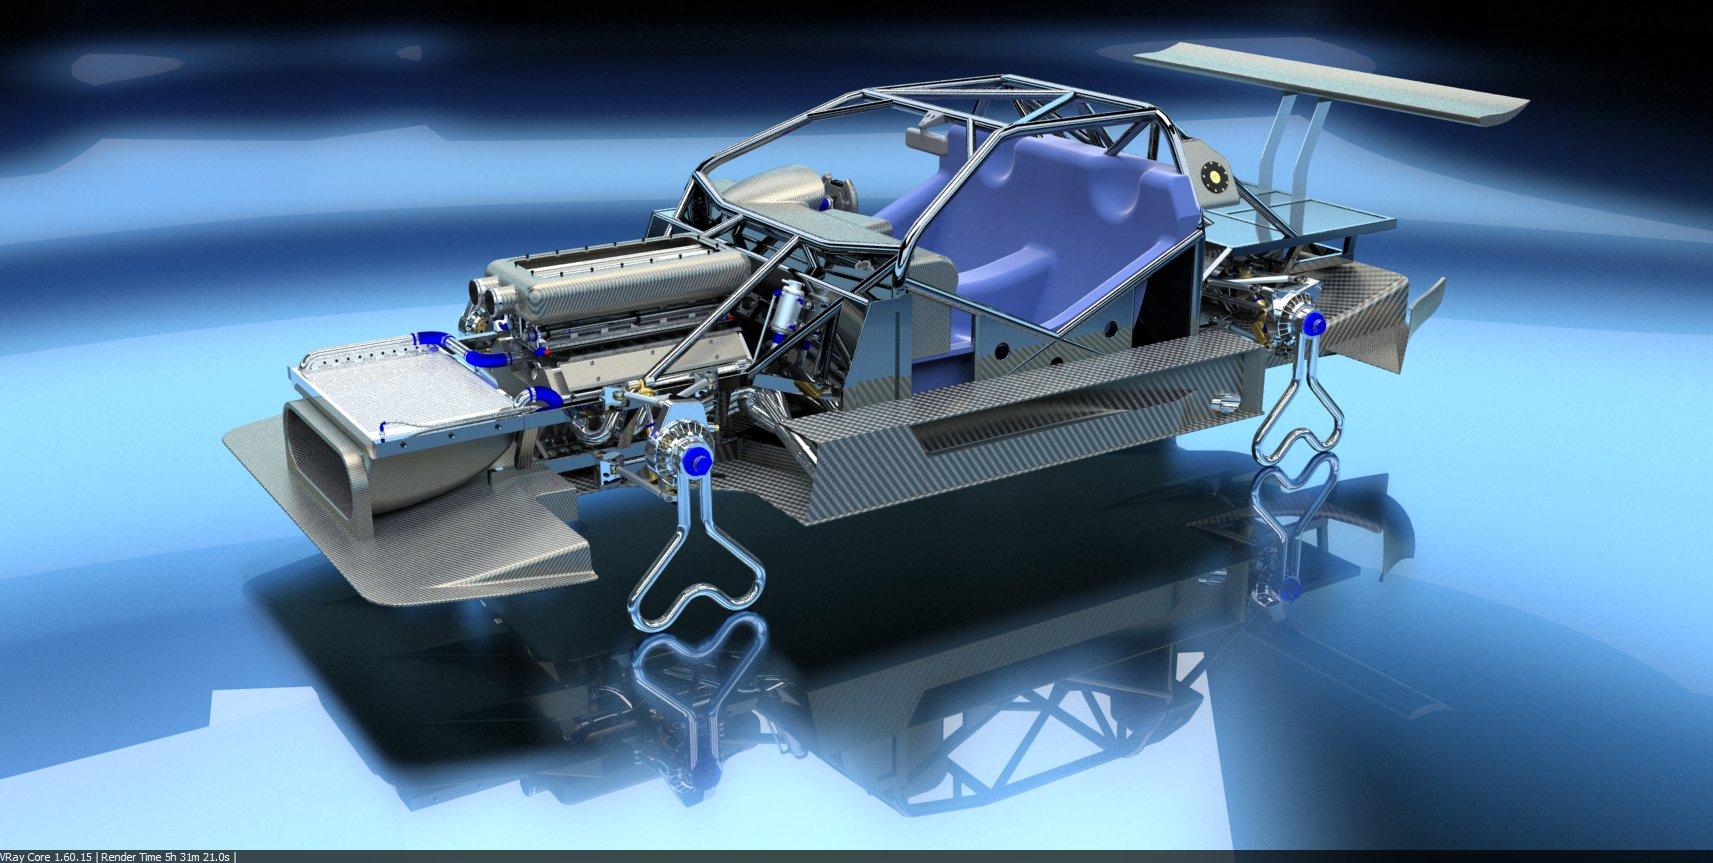 PEASNELL RACING DESIGN 575 GTC HILLCLIMB CAR DETAIL (7)